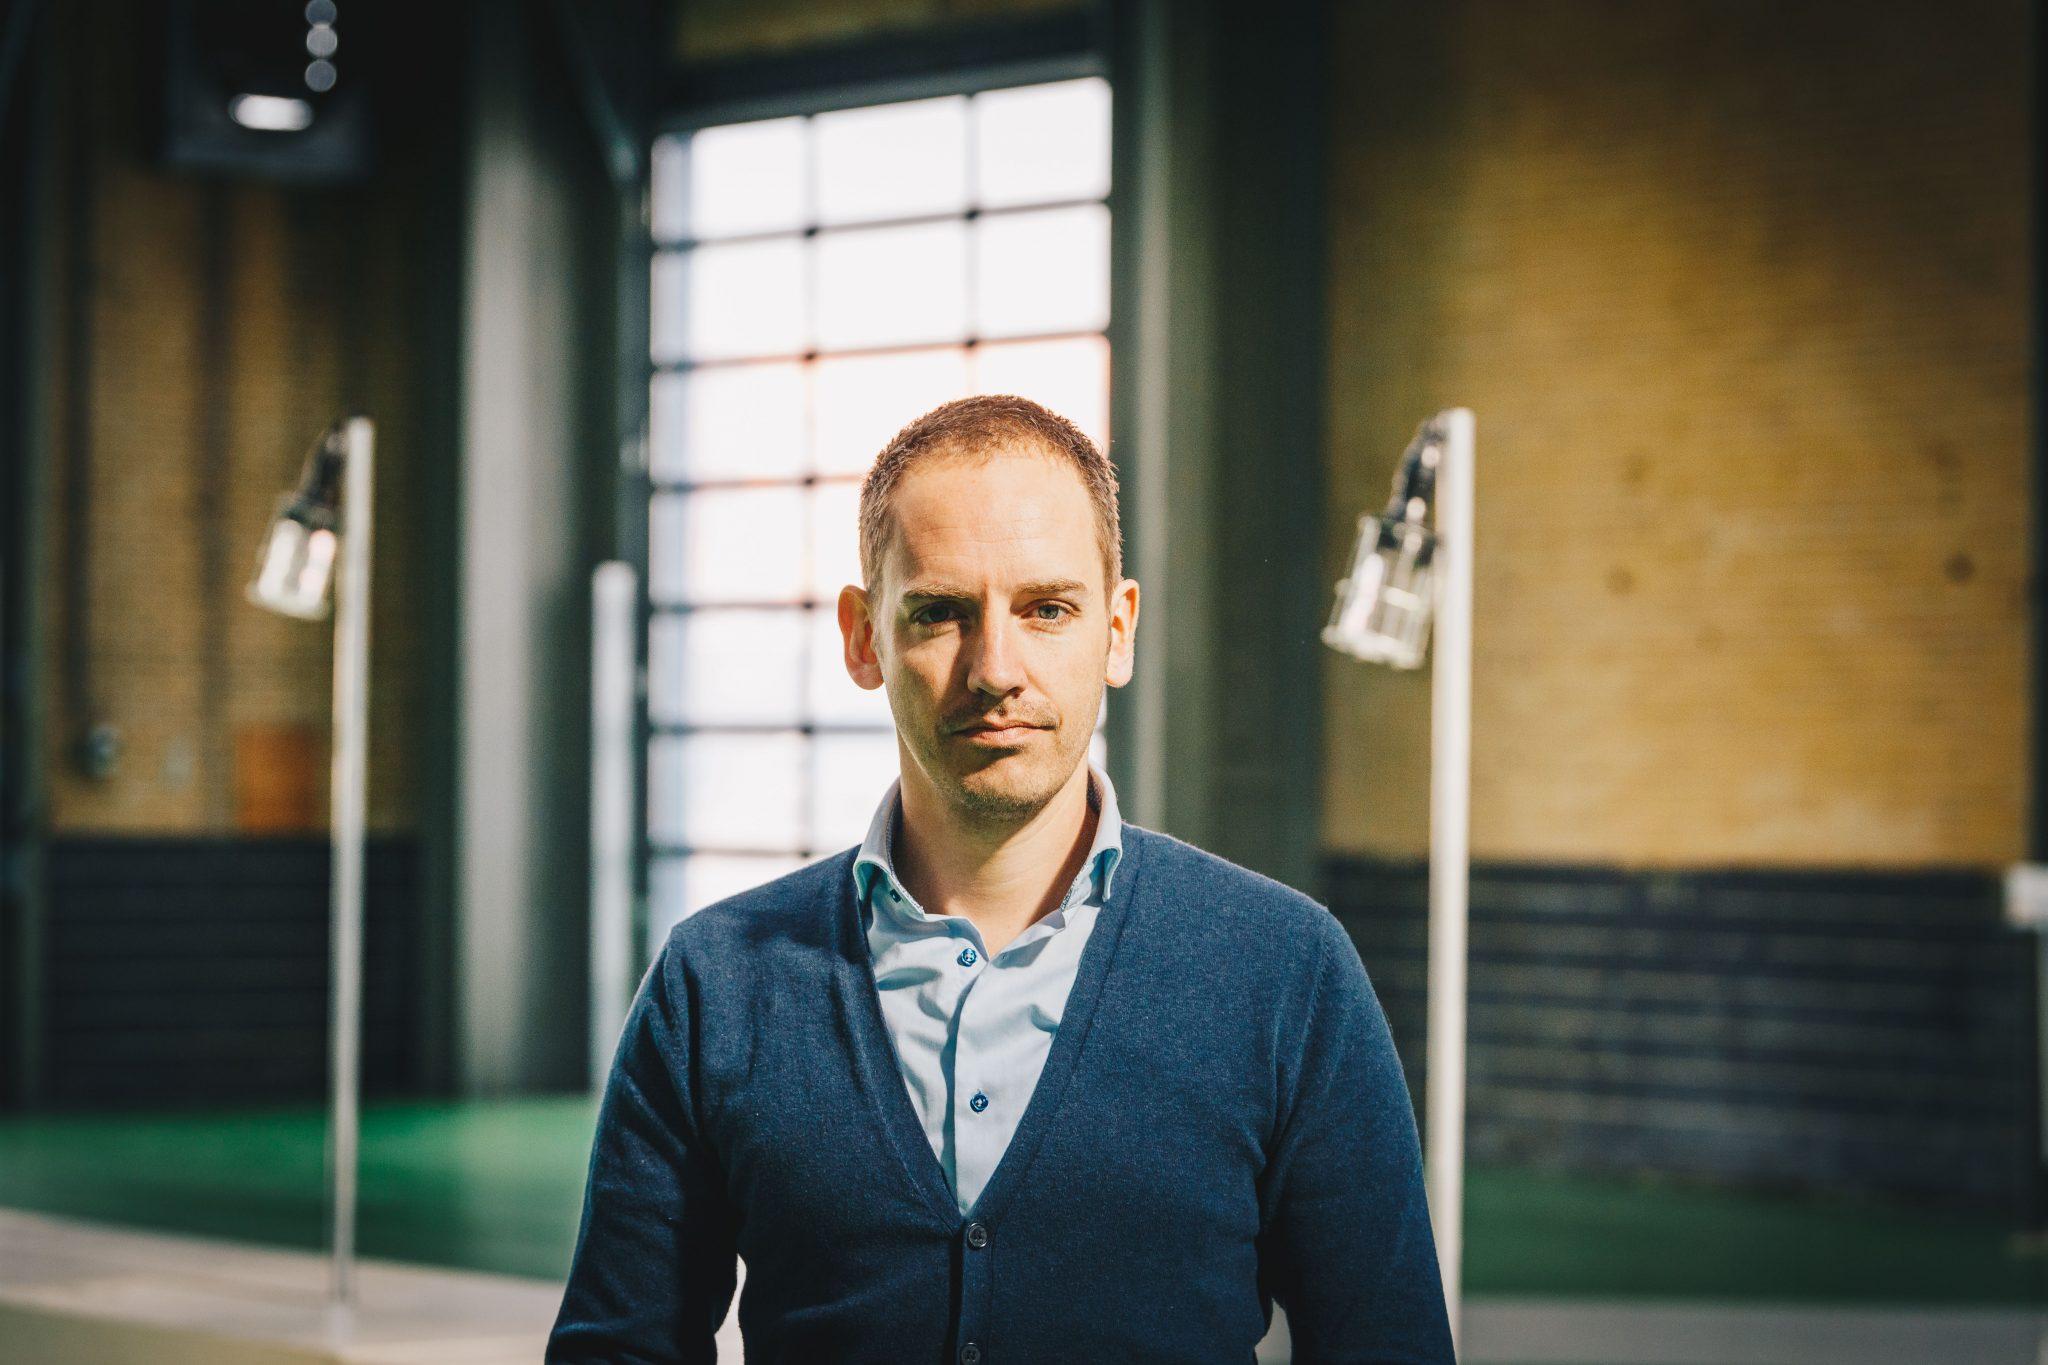 Ondernemer Mark Vletter wil de hele wereld online krijgen